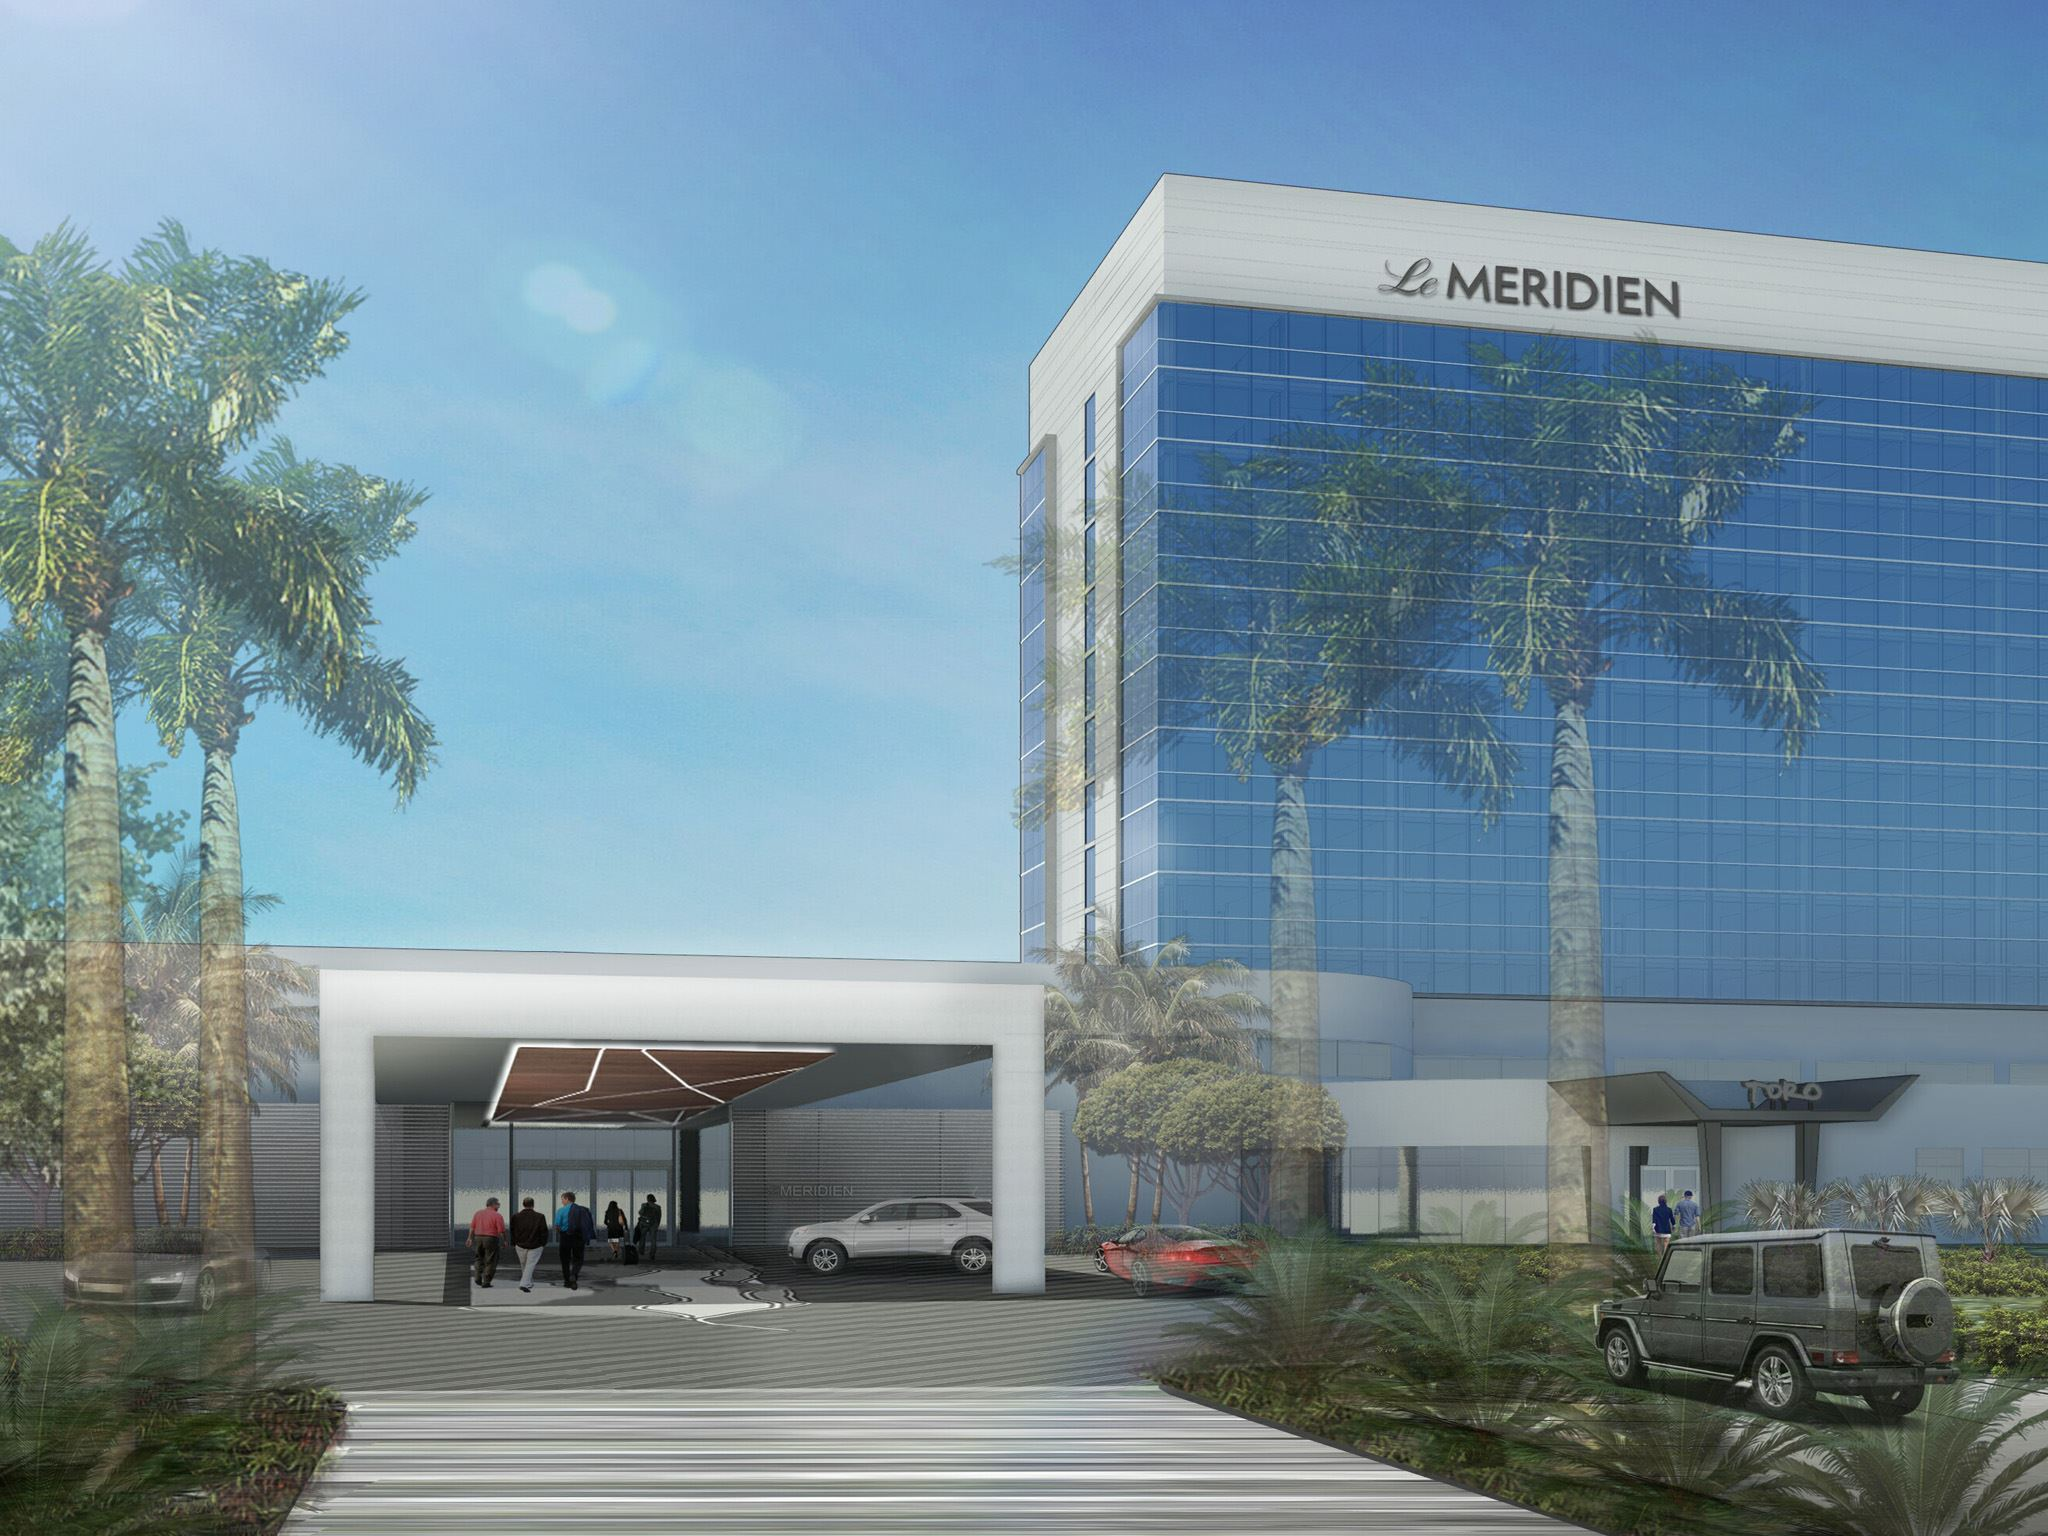 Le Meridien Hotel Dcota City Of Dania Beach Florida Official Meriden